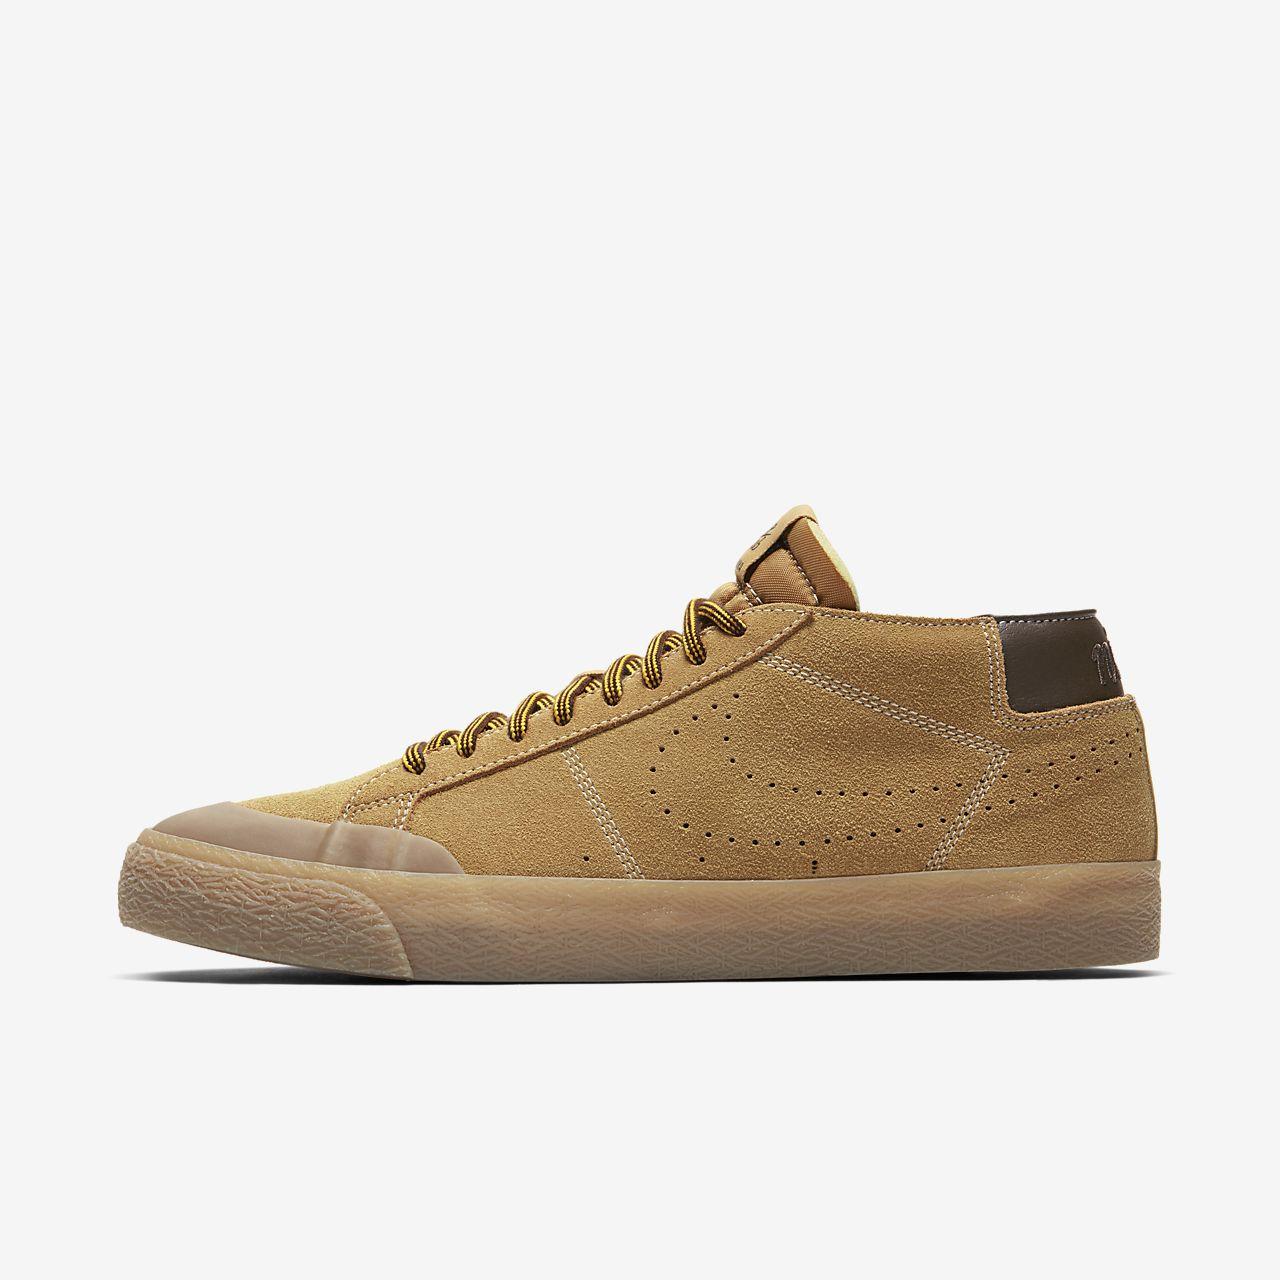 Nike SB Zoom Blazer Chukka XT Premium Kaykay Ayakkabısı